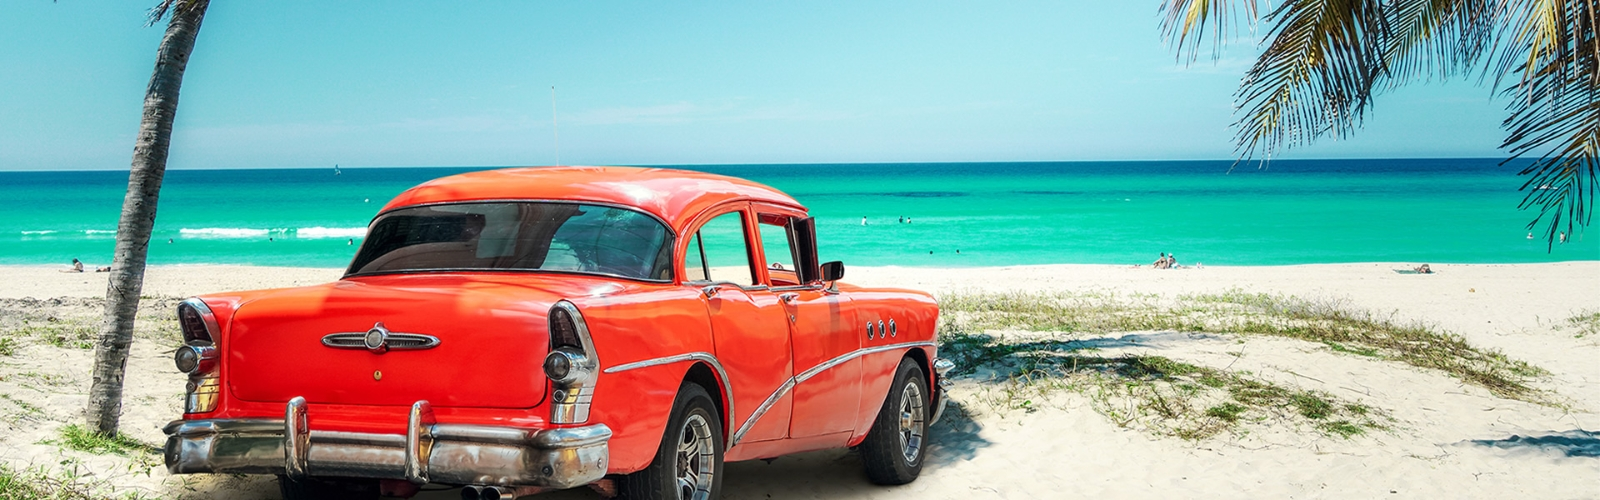 Cuba Holidays 2021 2022 Cuba All Inclusive Holidays Virgin Holidays